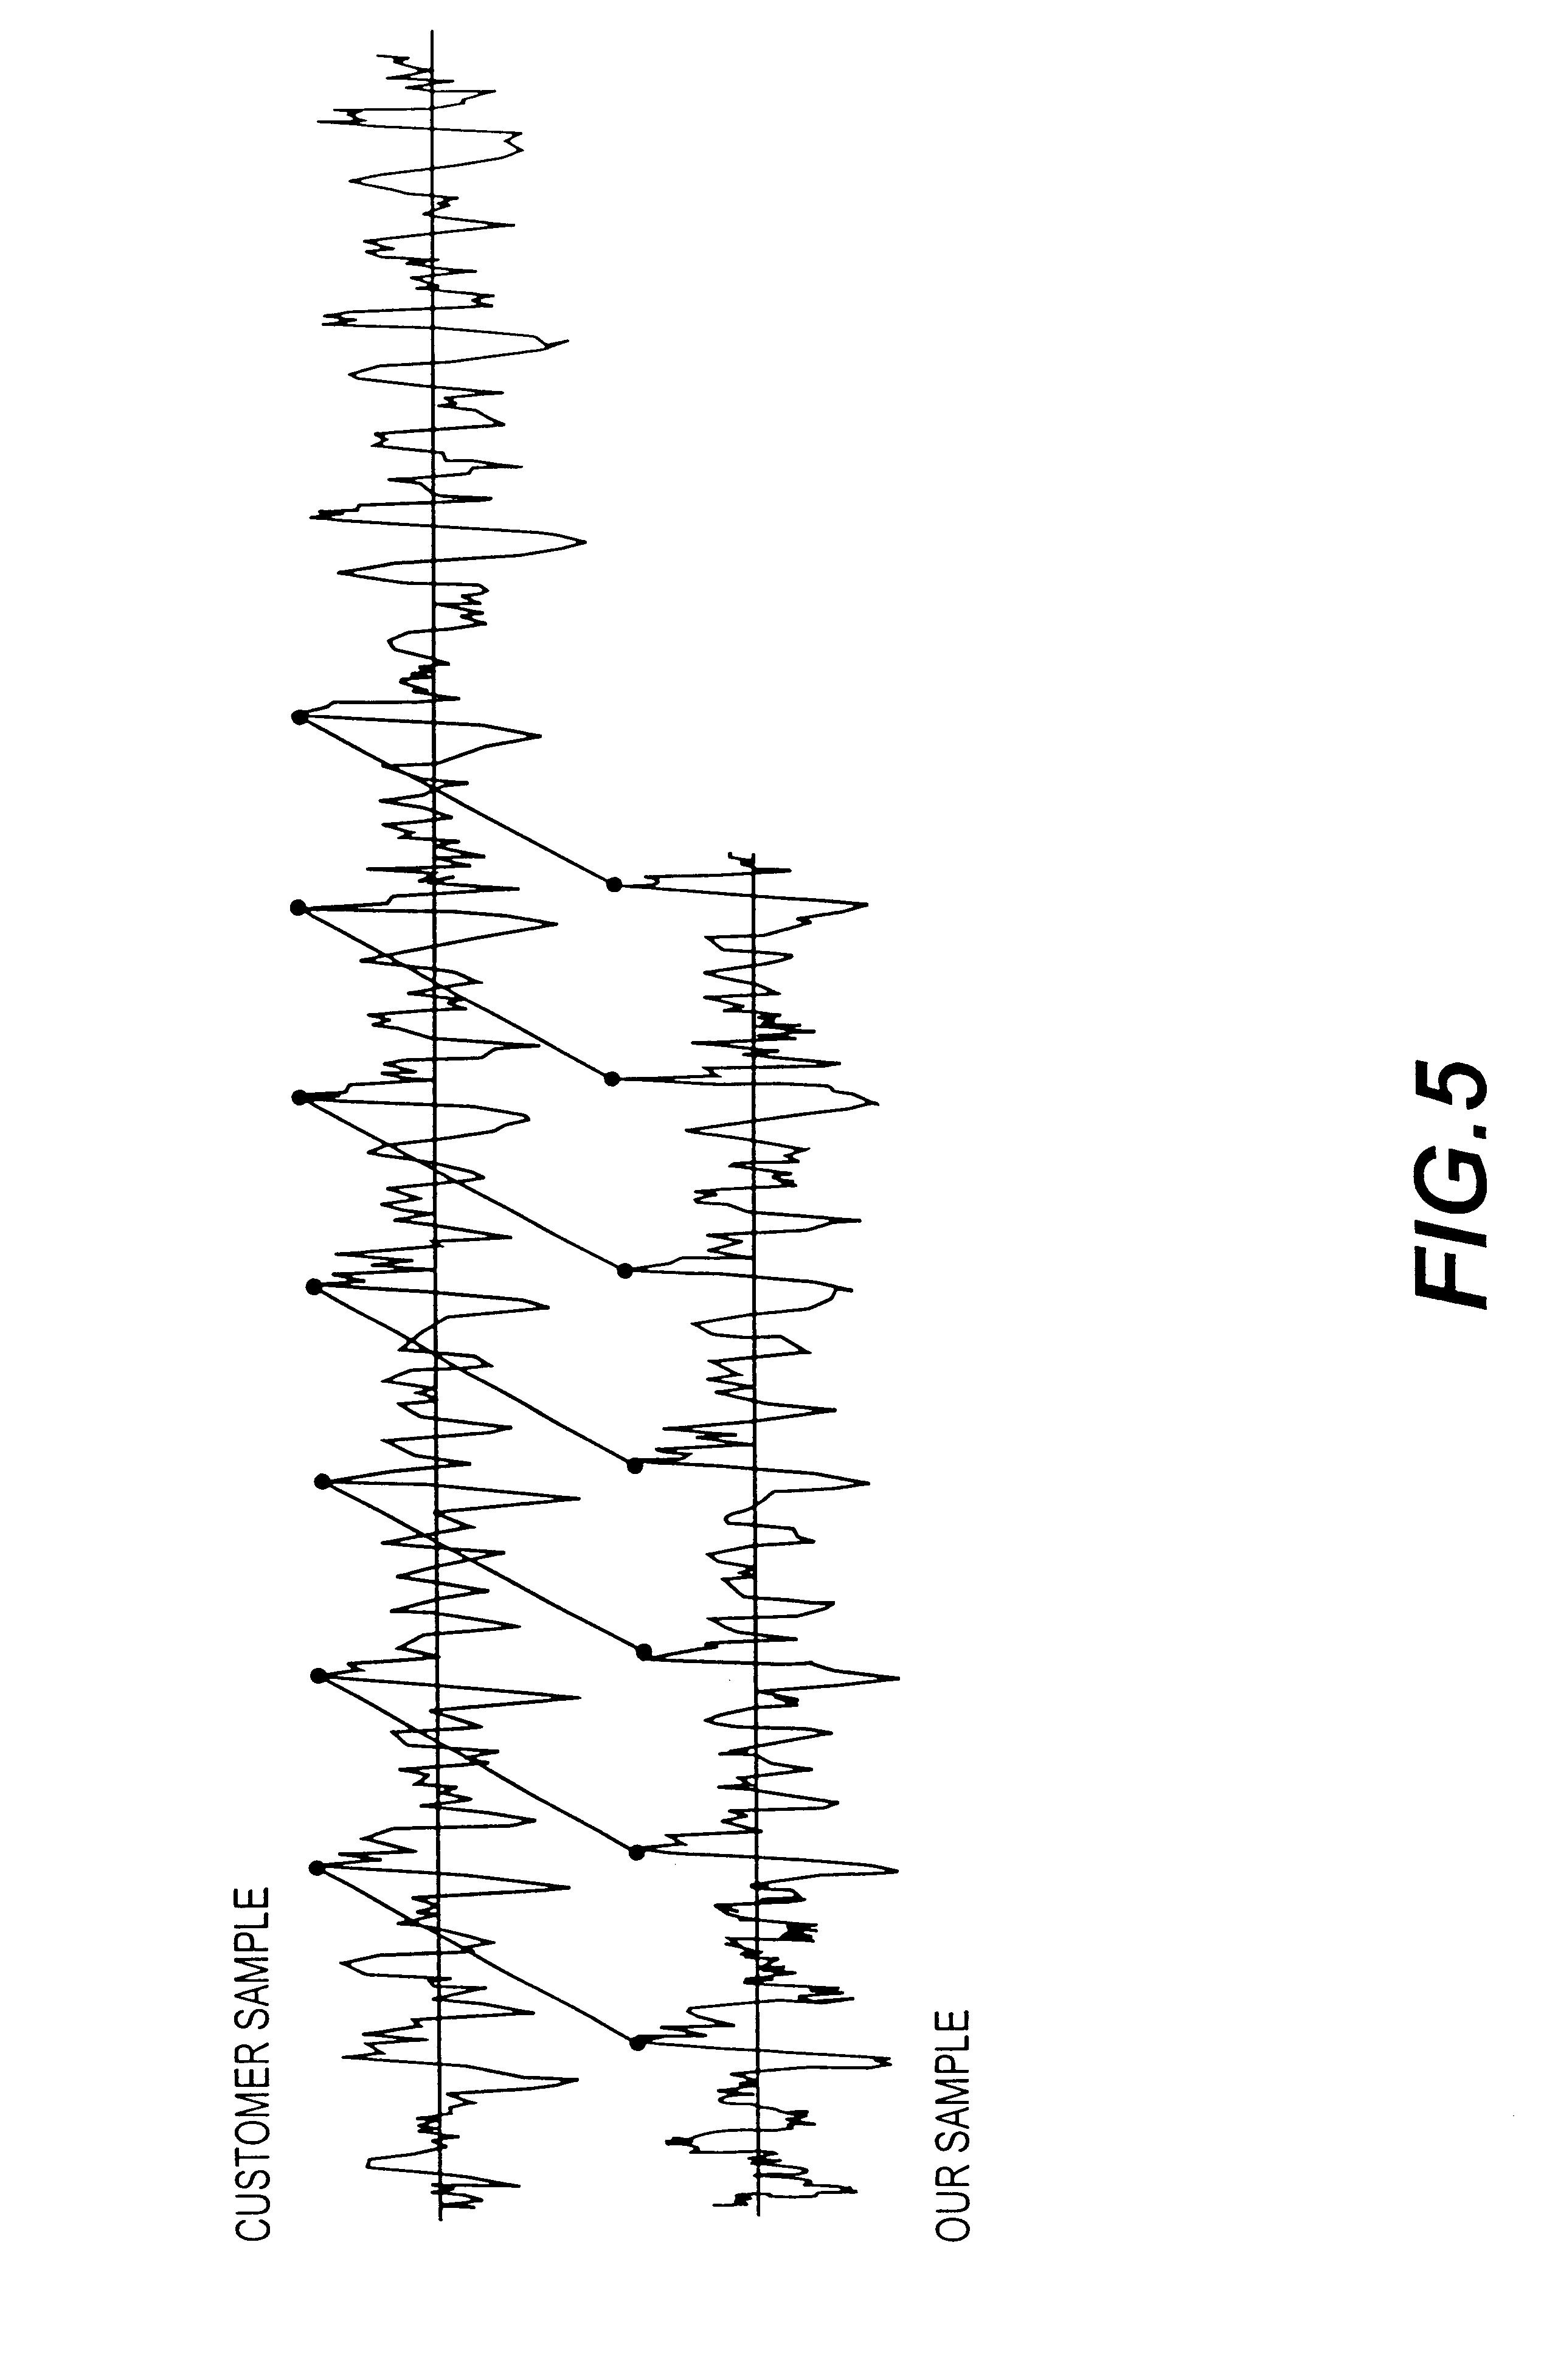 Patent US 6,609,105 B2